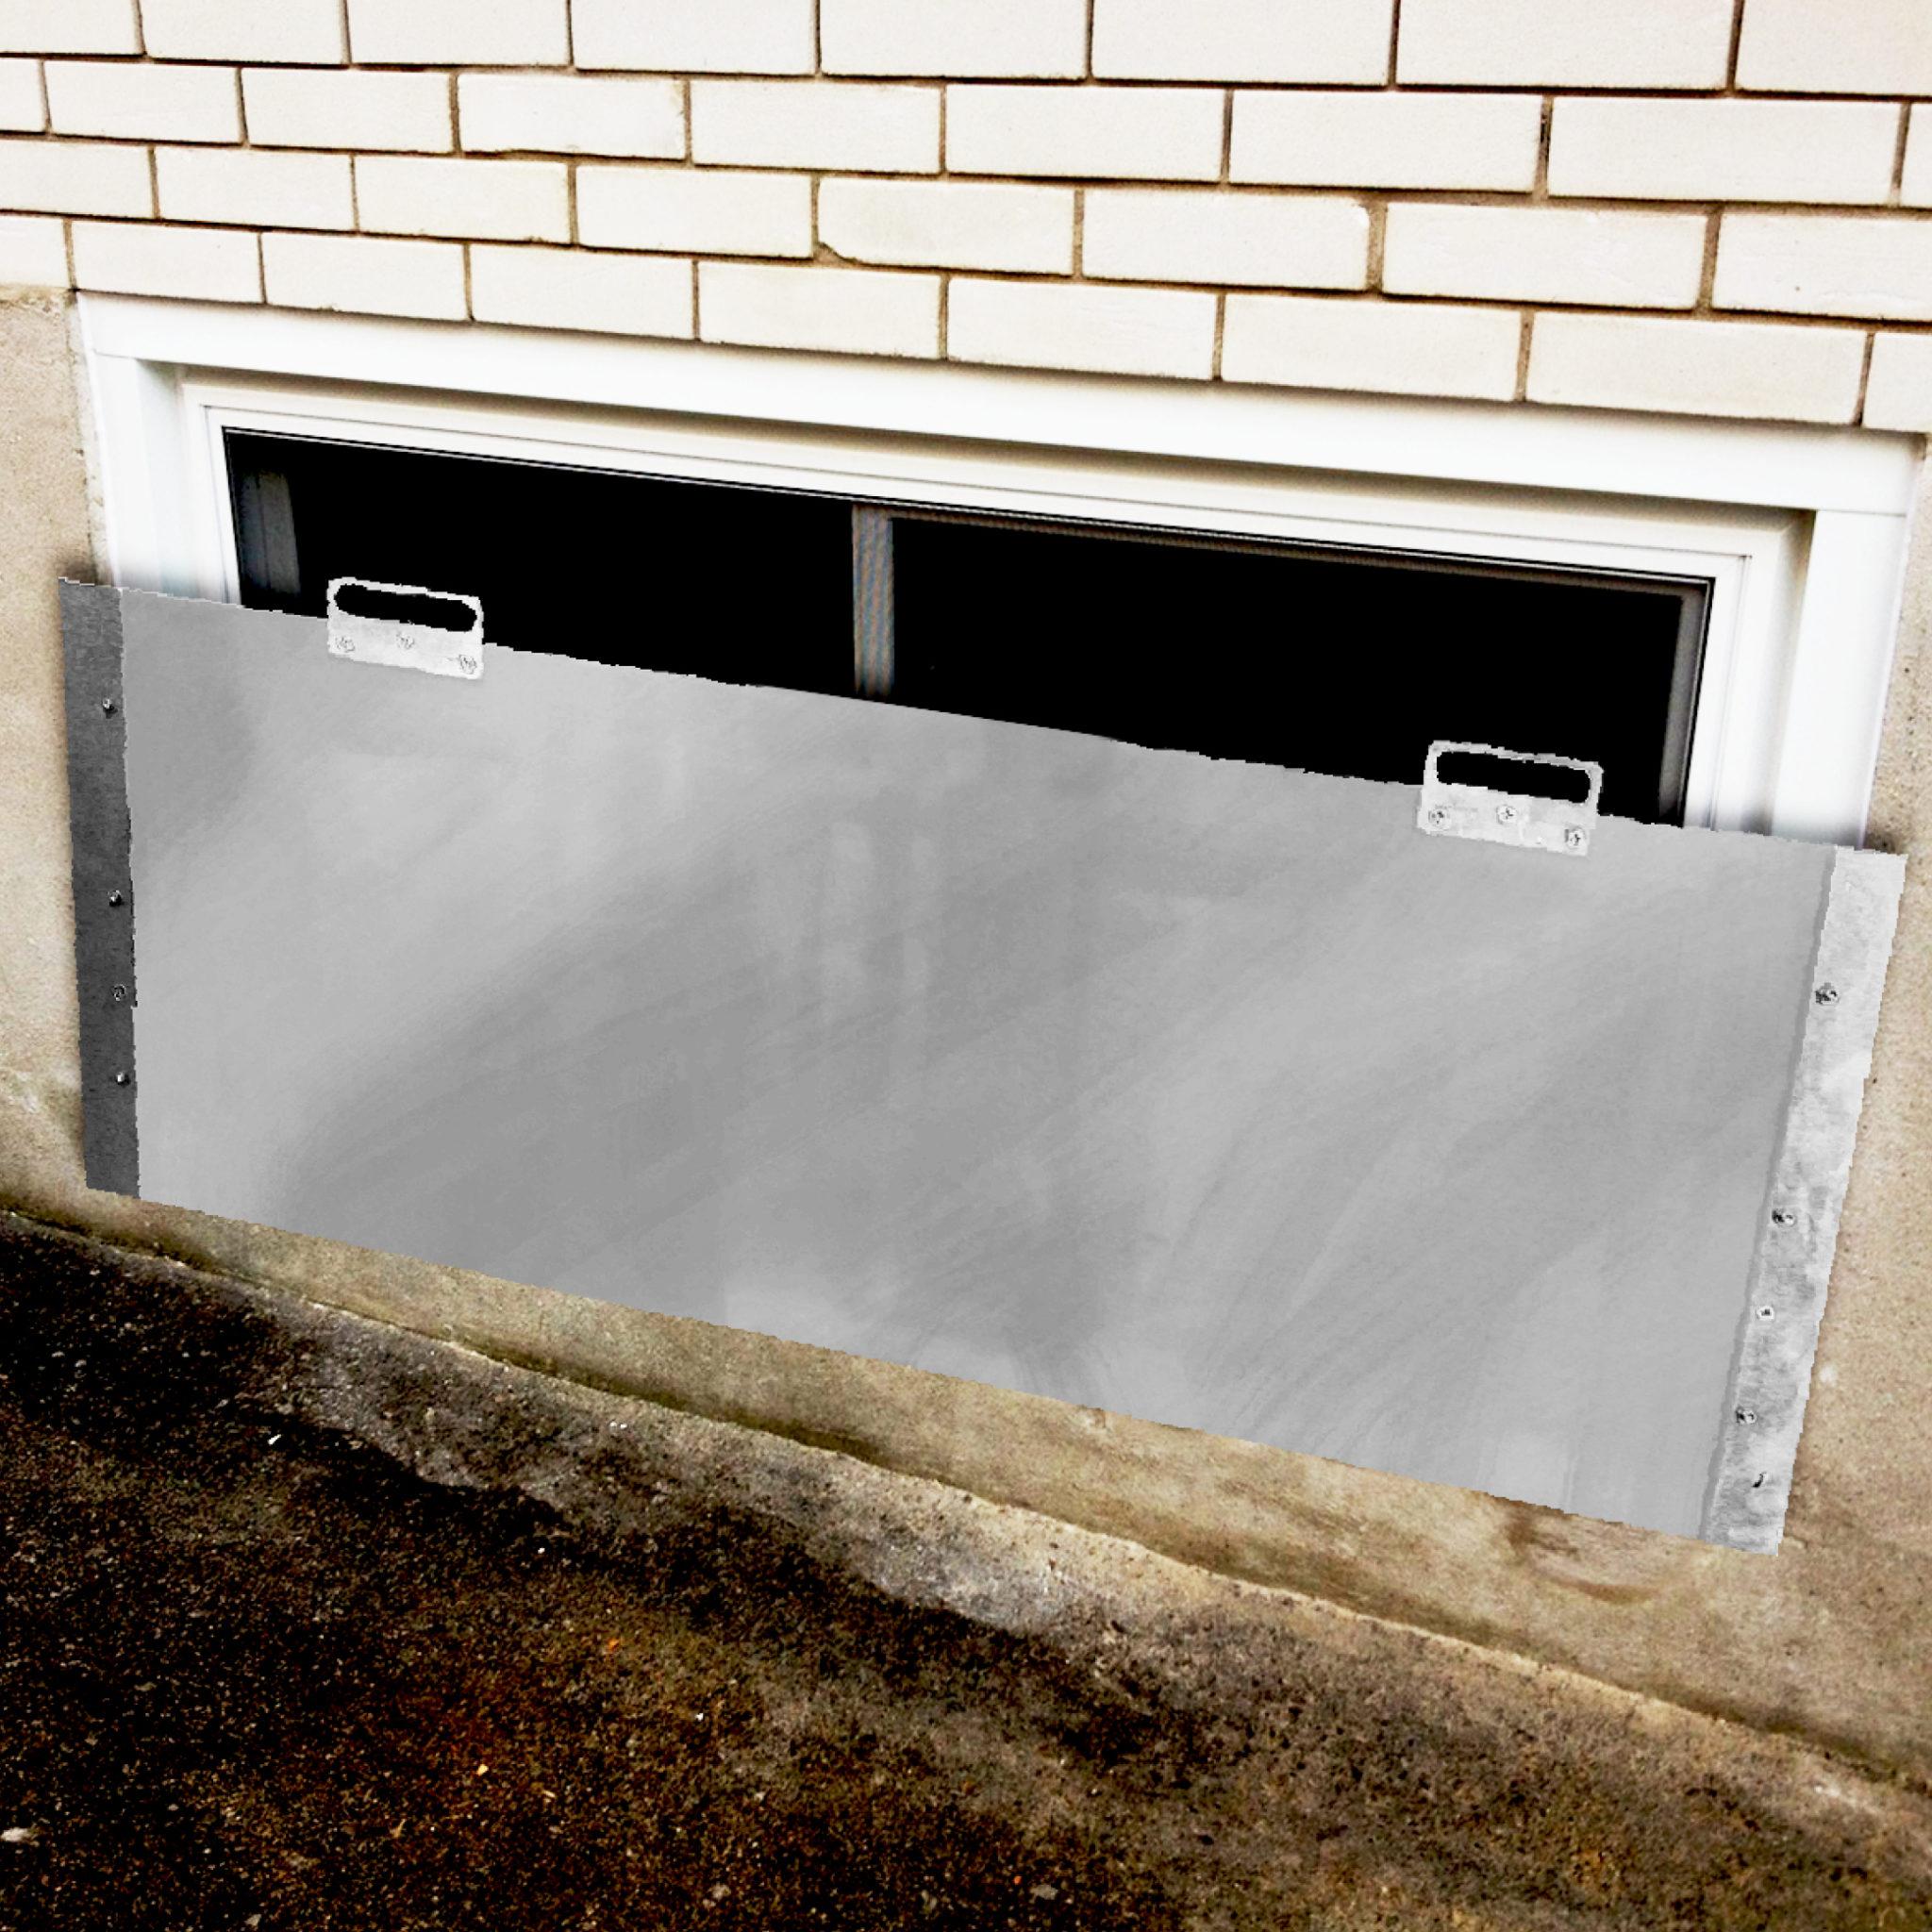 Doorfloodbarrier legacy manufacturing llc